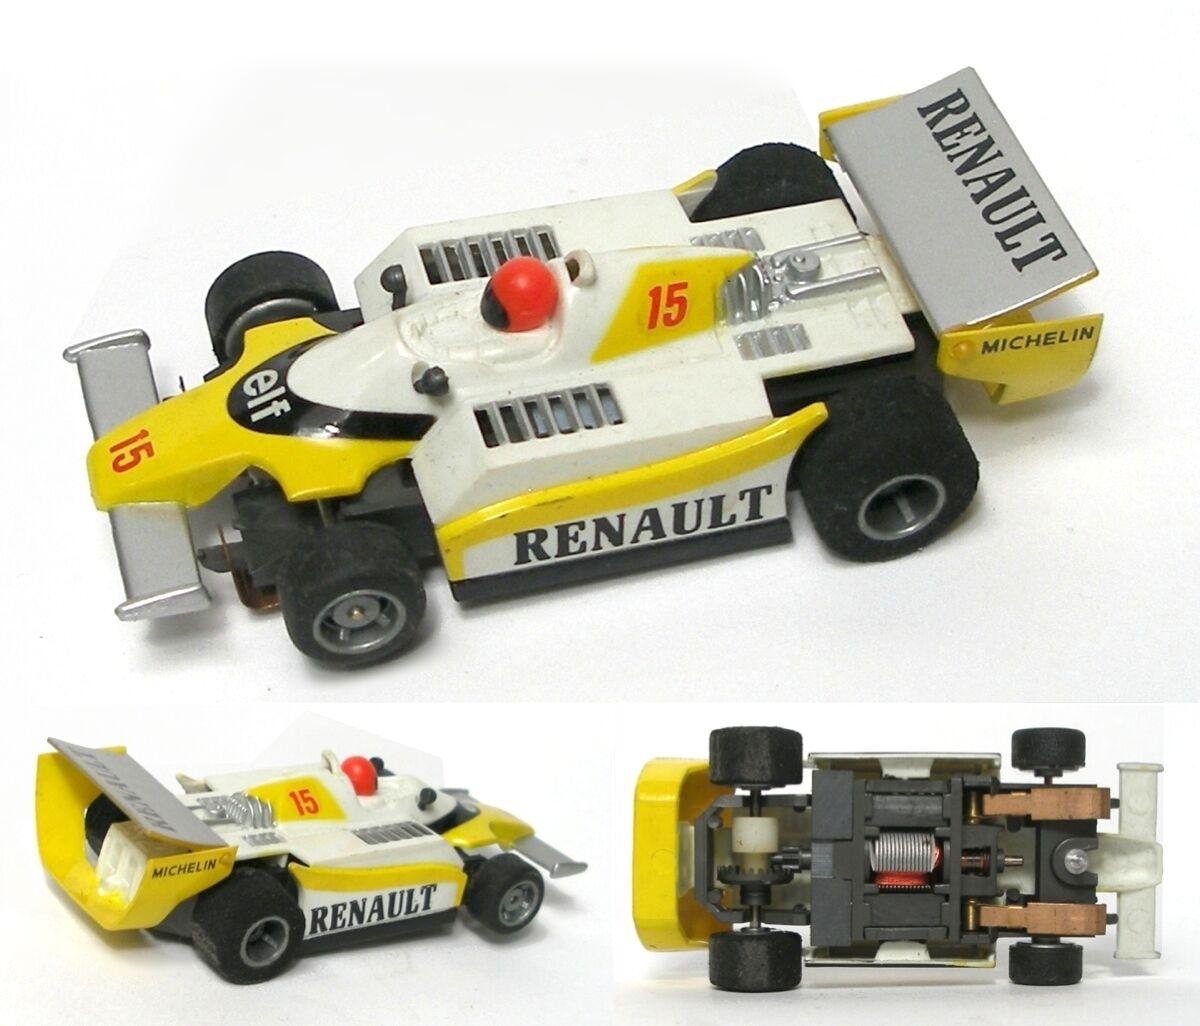 1981-82 Tyco 440 Magnum F1 Indy 15 Renault Elf Ho Slot Car Unused Sweet 8908